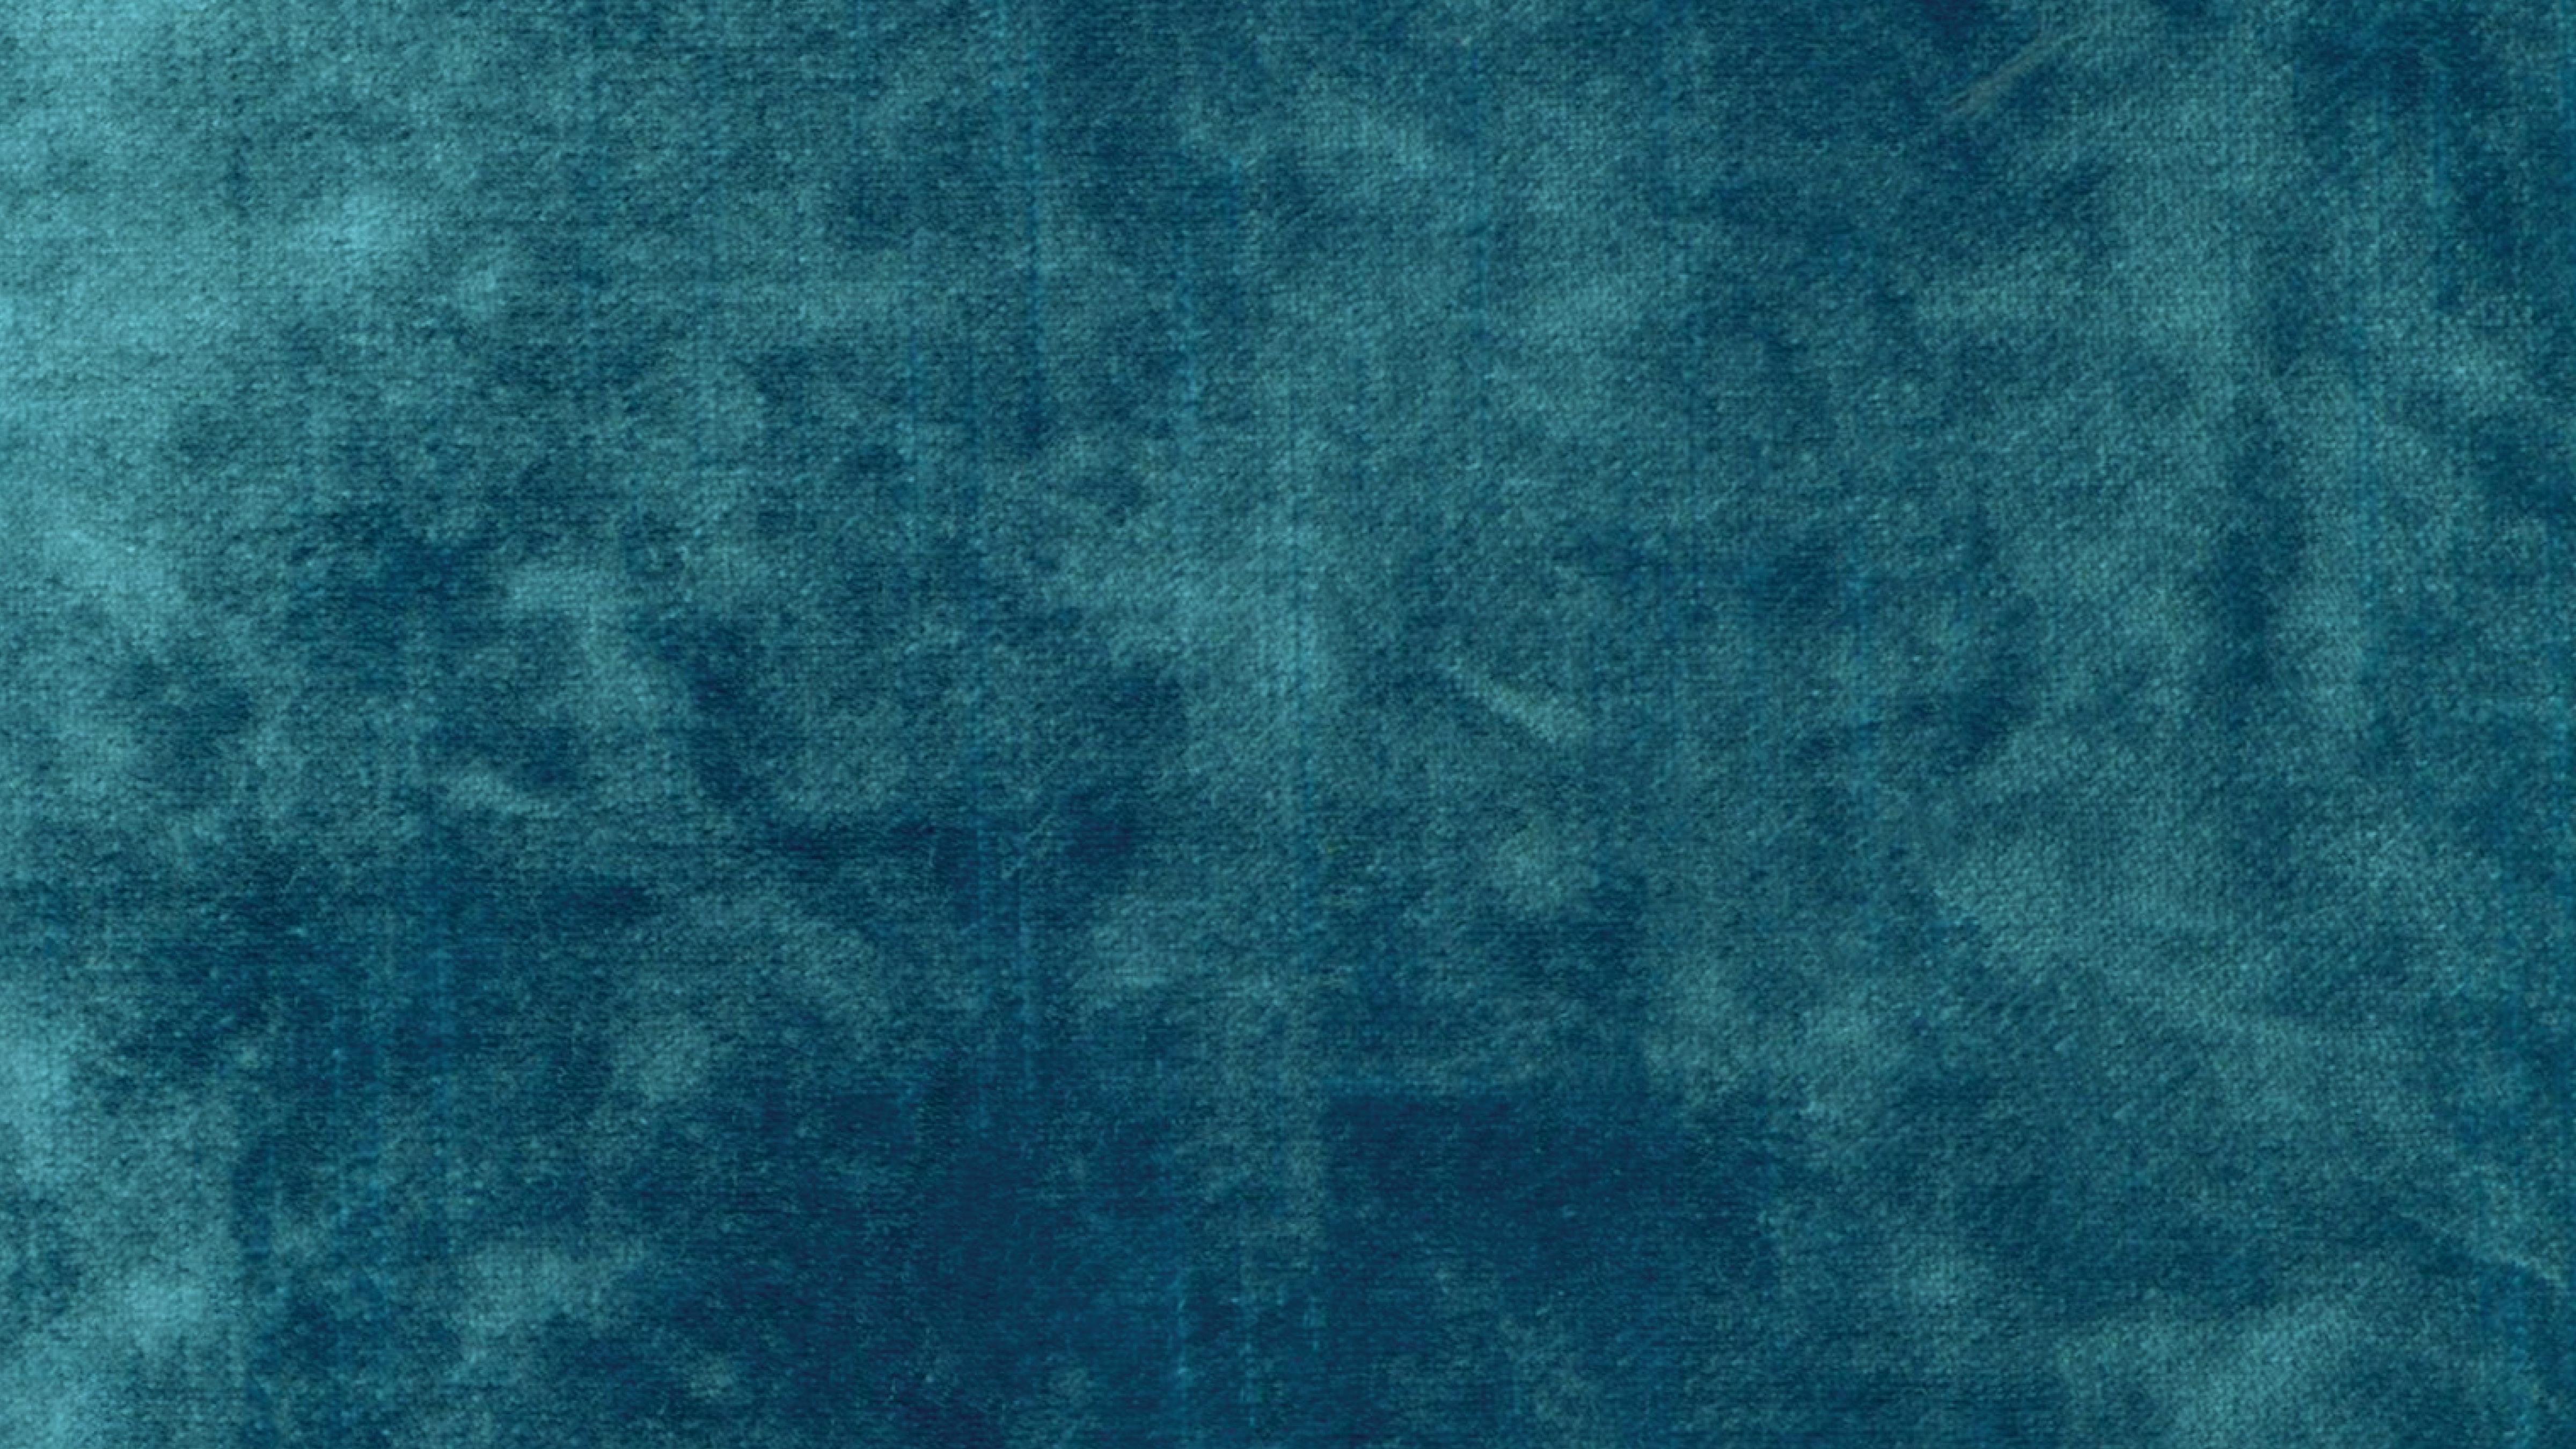 ROL 3Bs texture Slide